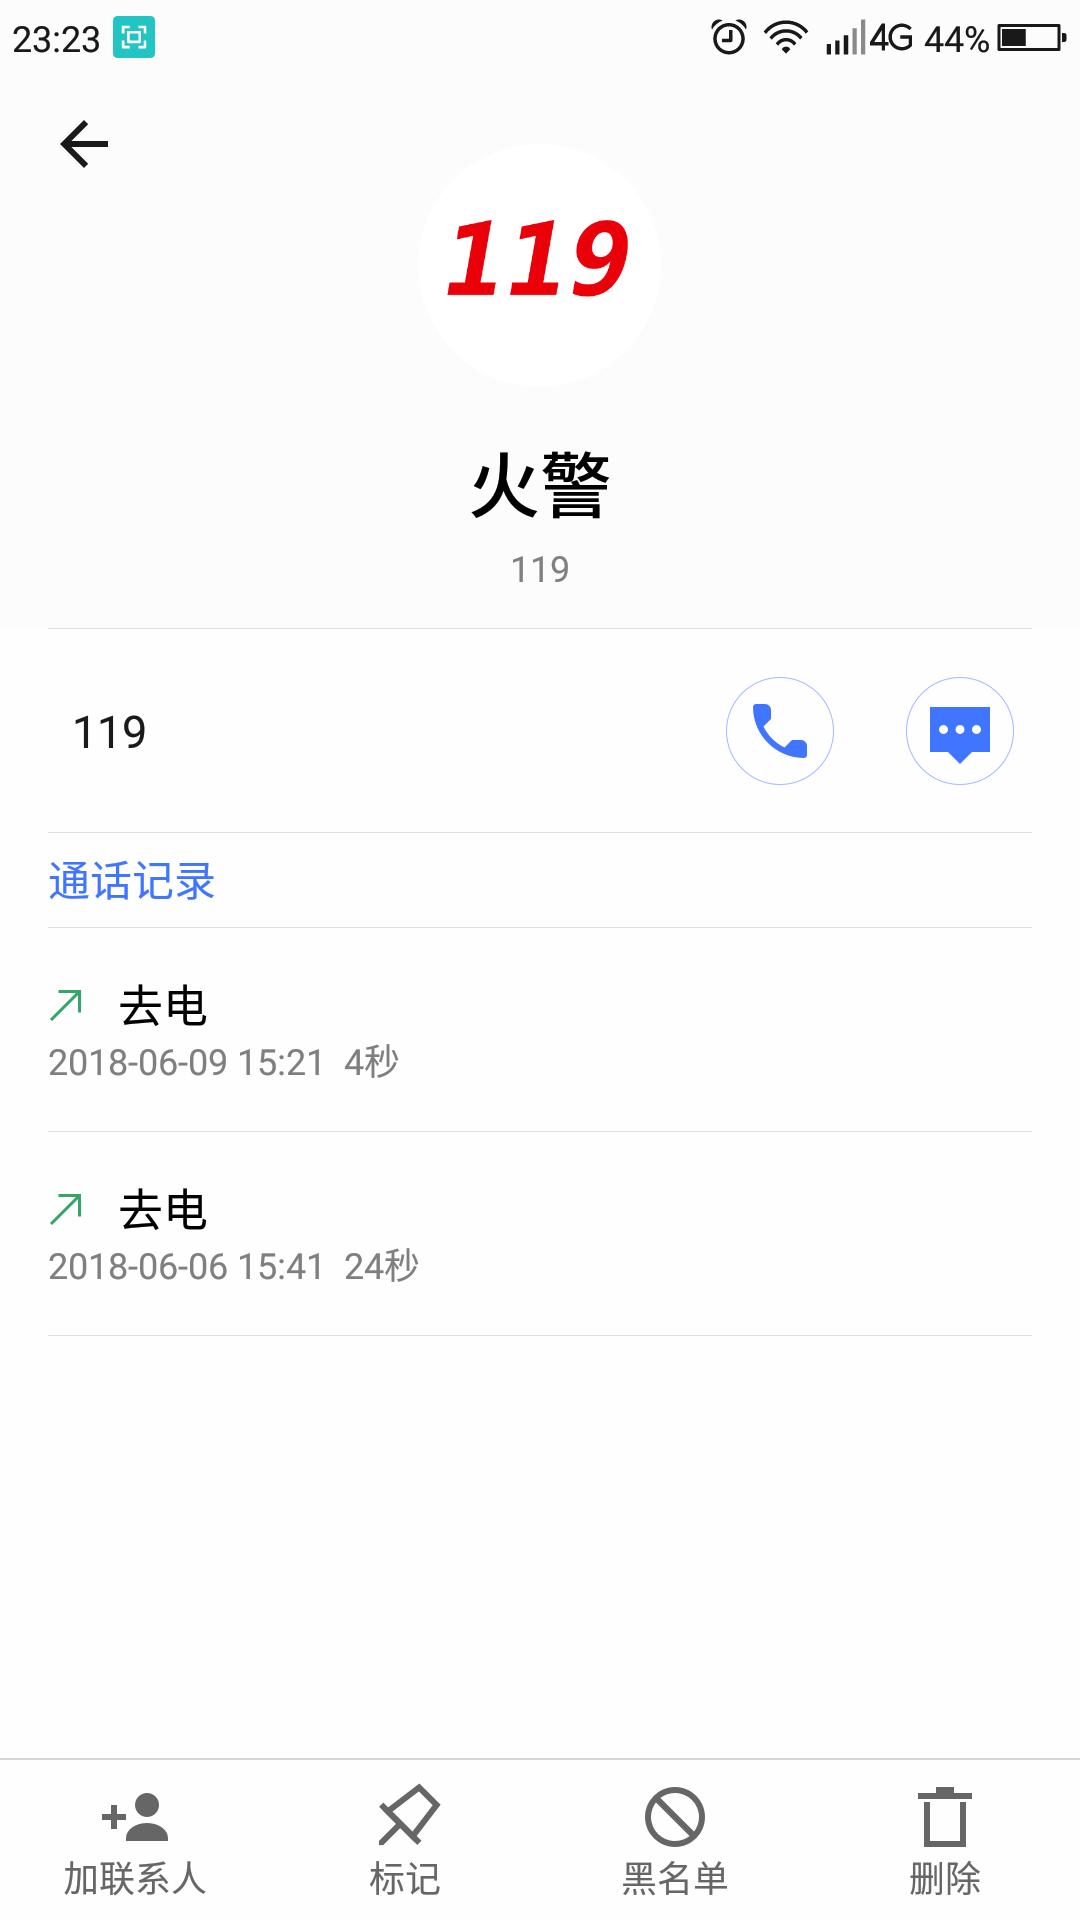 Screenshot_2018-06-16-23-24-01.png